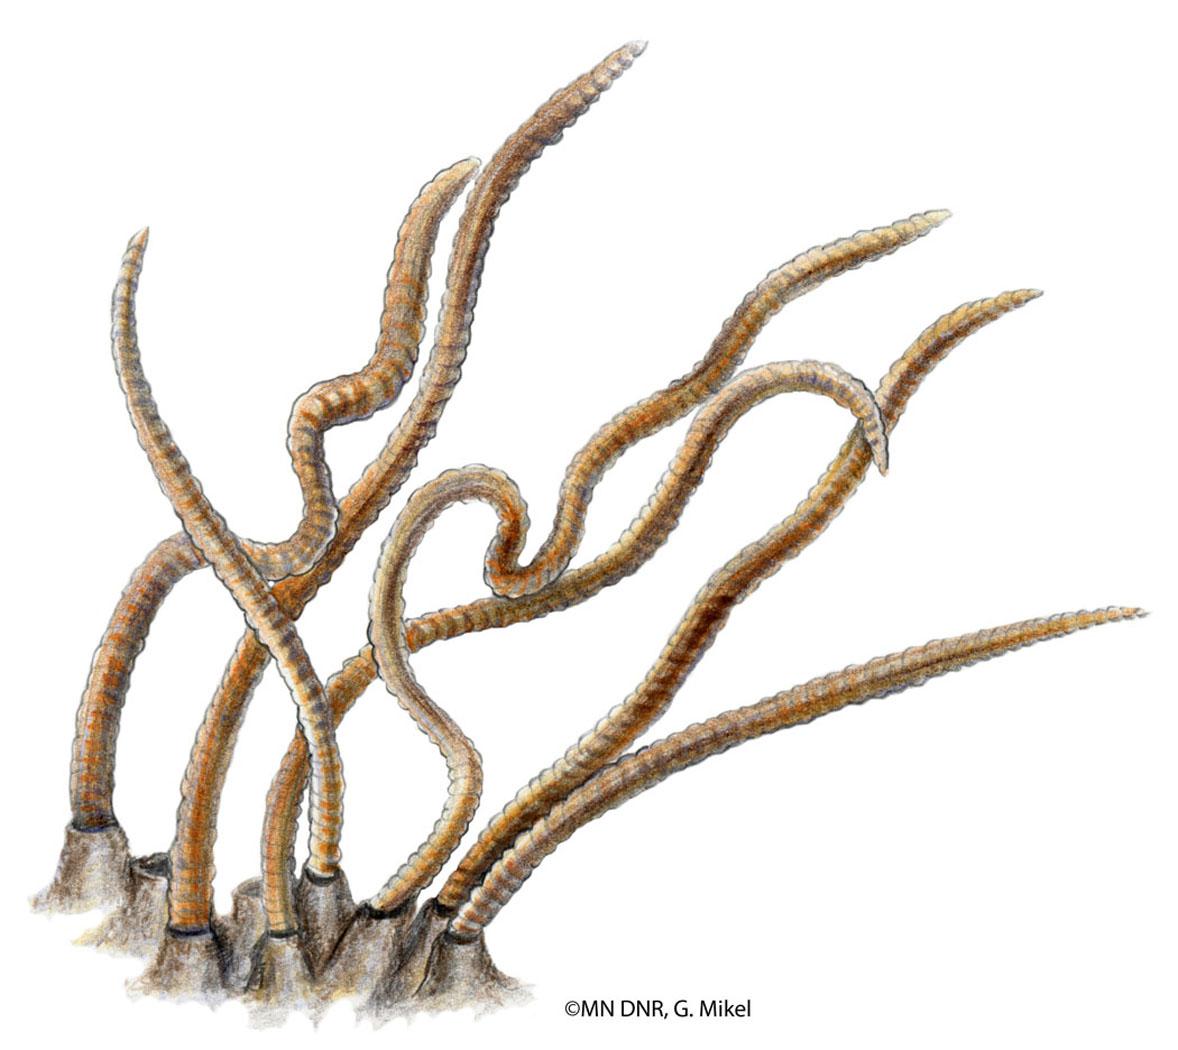 Tubifex Worm